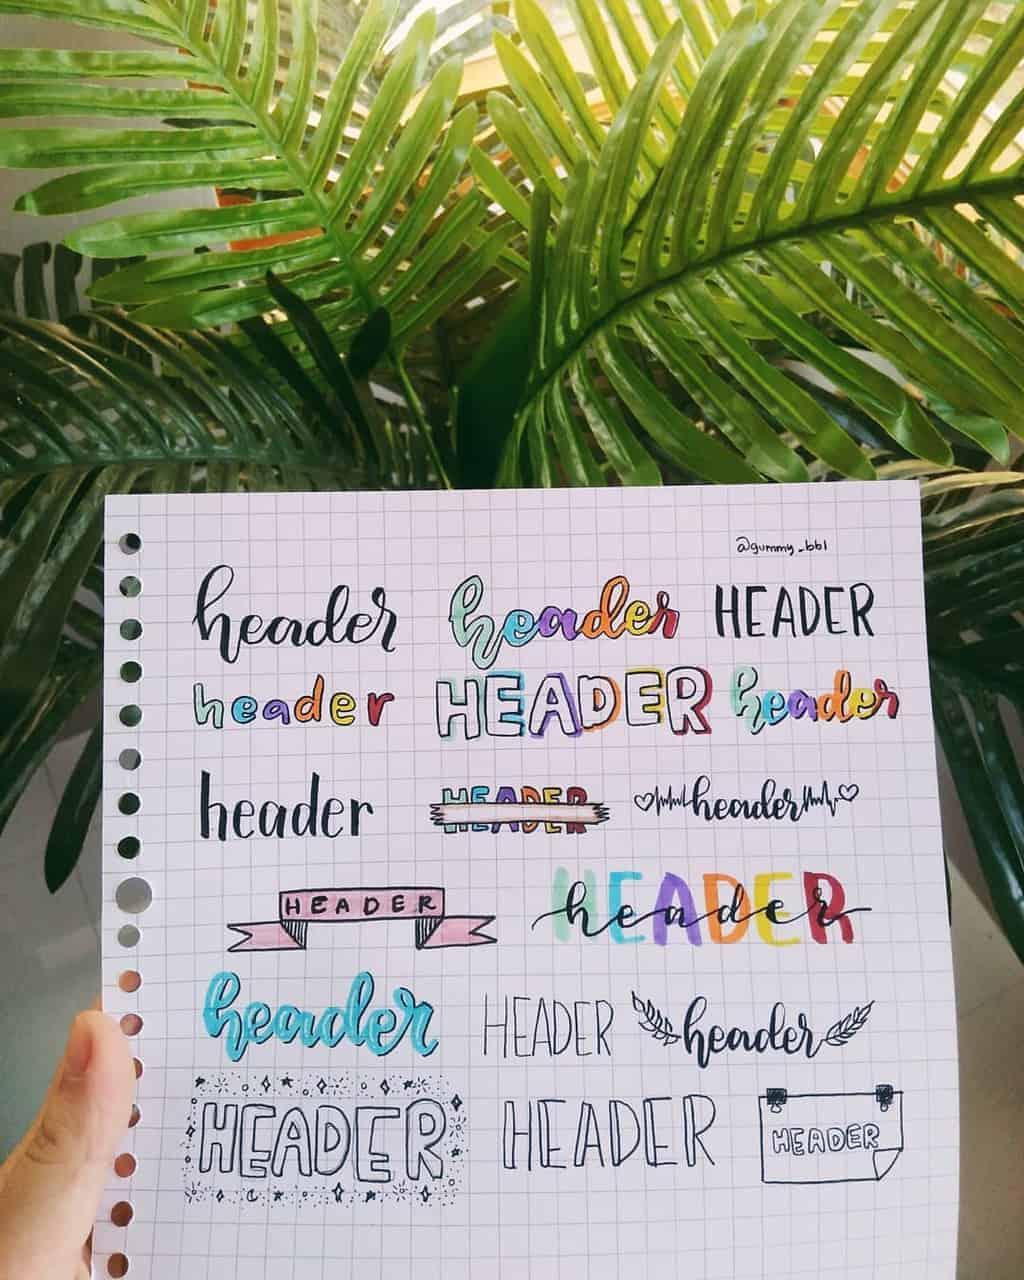 Bullet Journal Headers, ideas by @gummy_bbl | Masha Plans